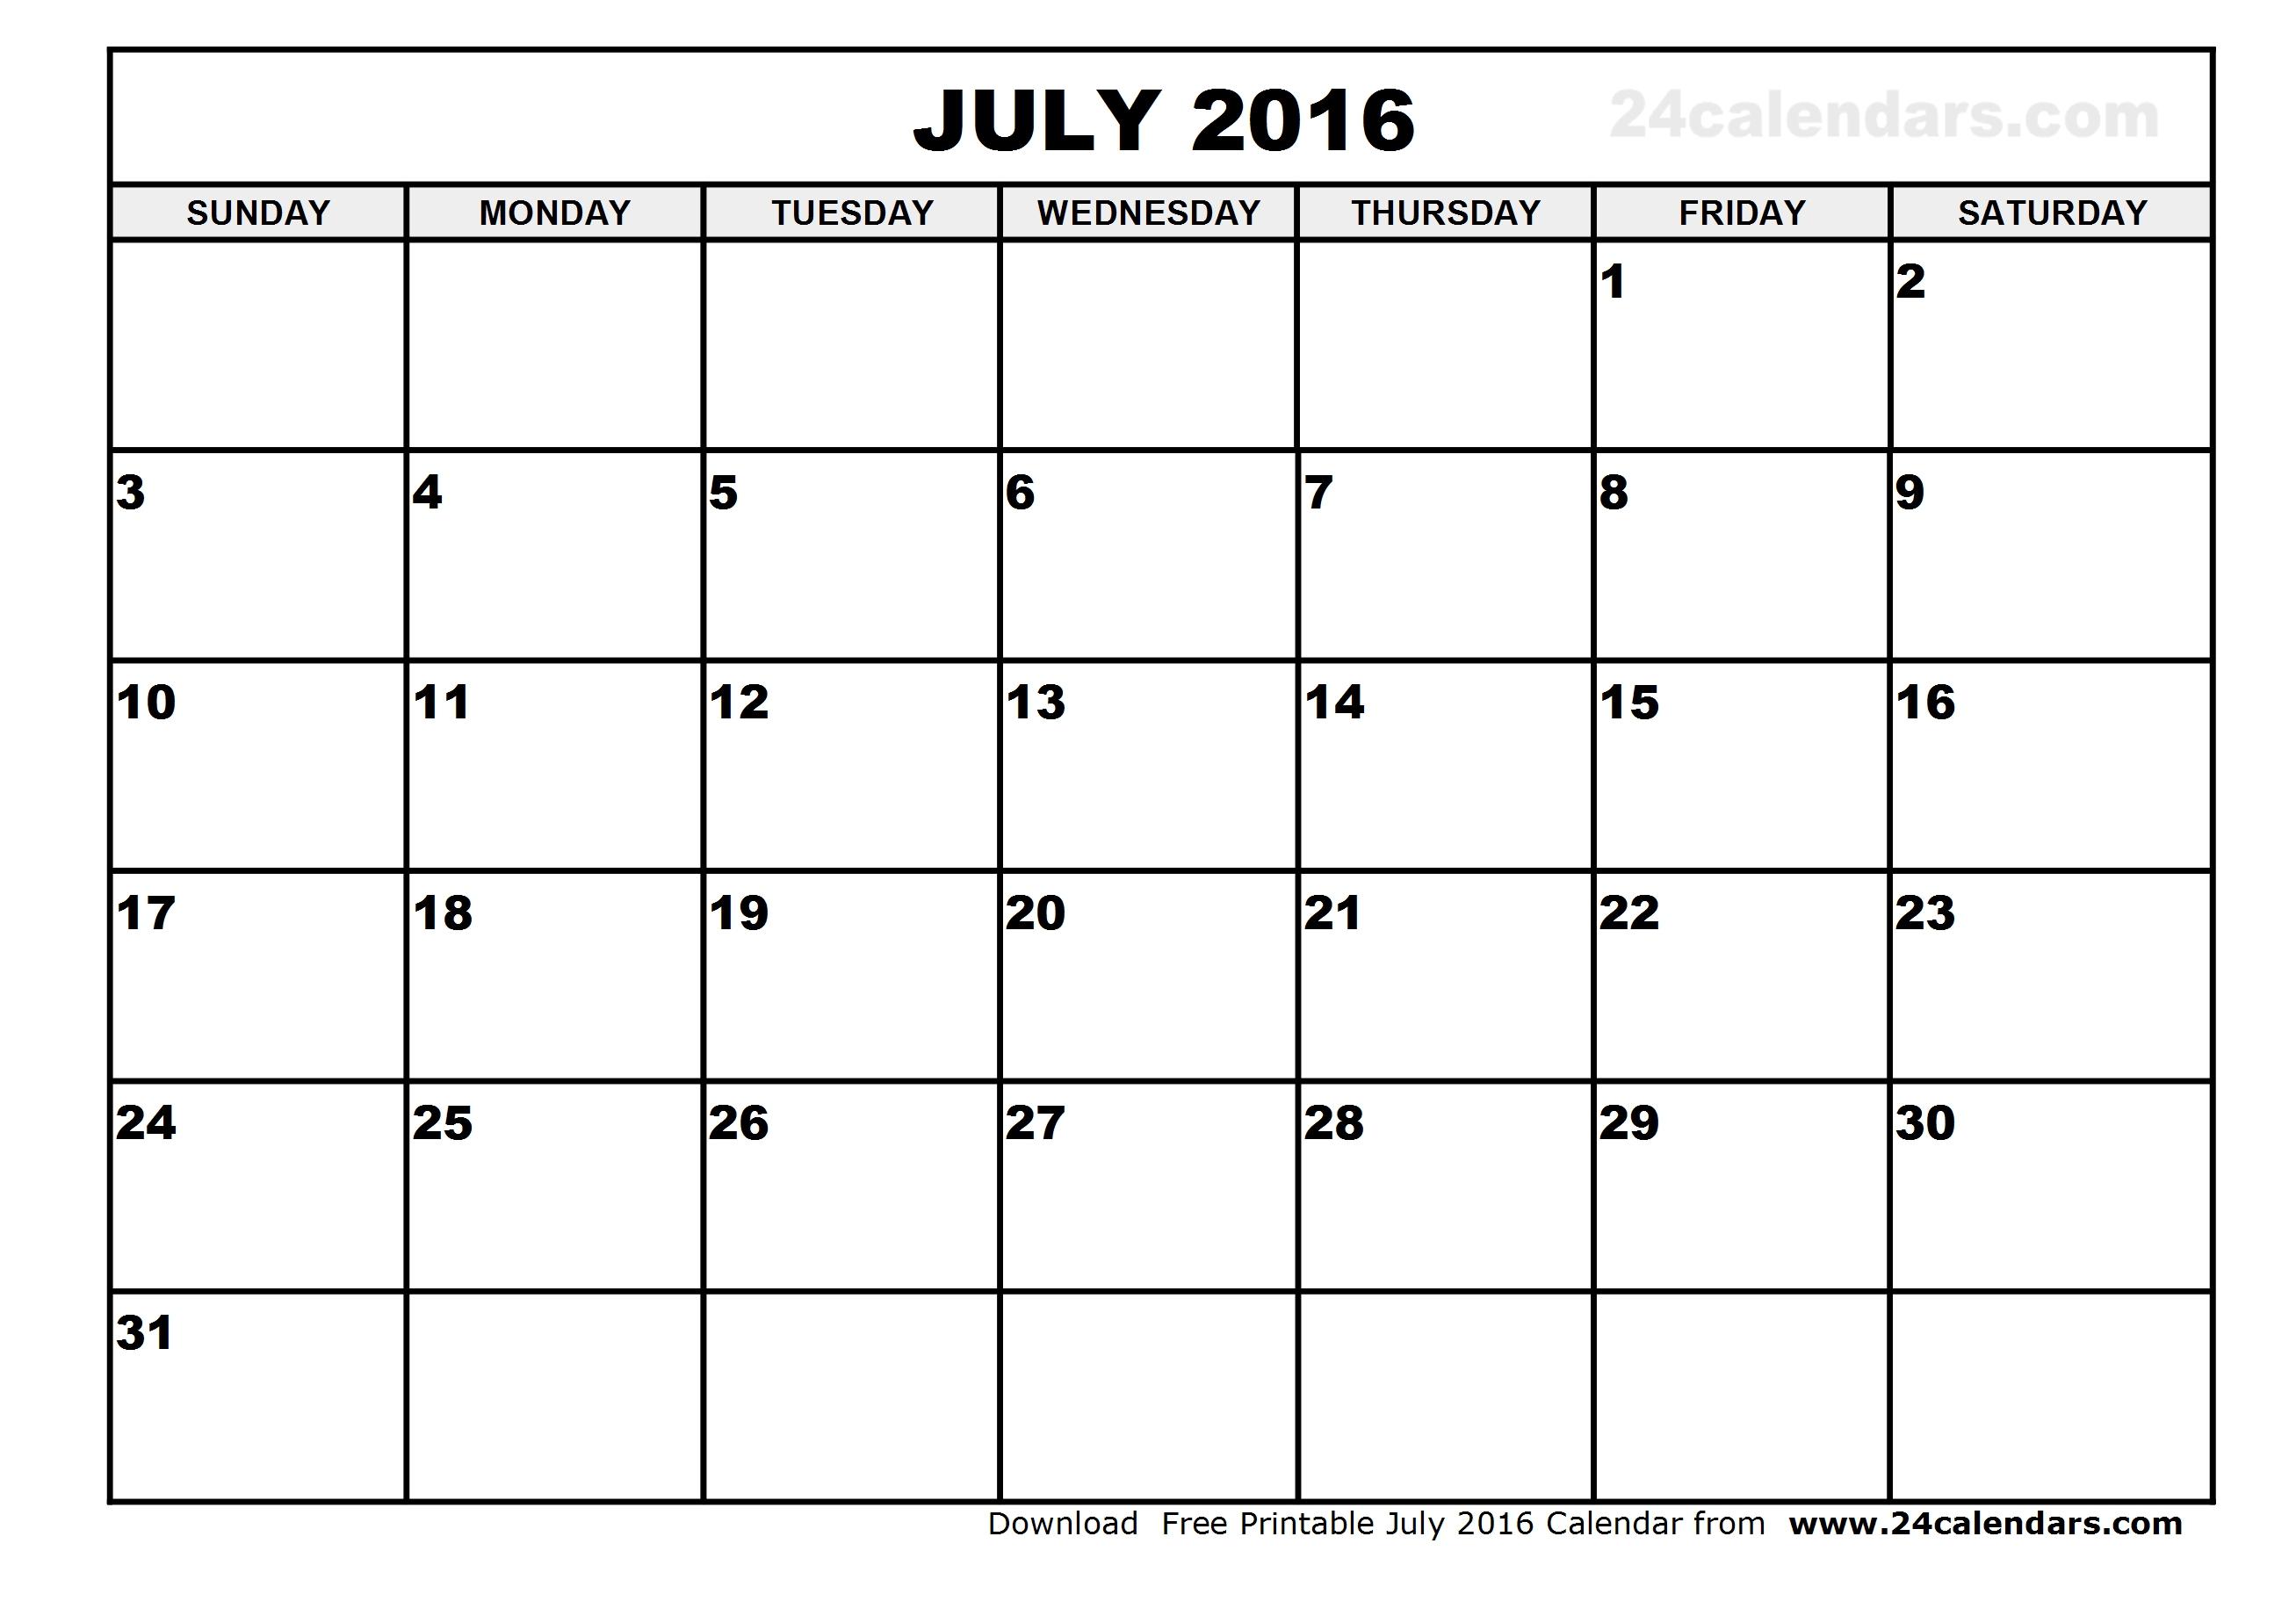 Brilliant Ideas for July 2016 Calendar Template Editable About